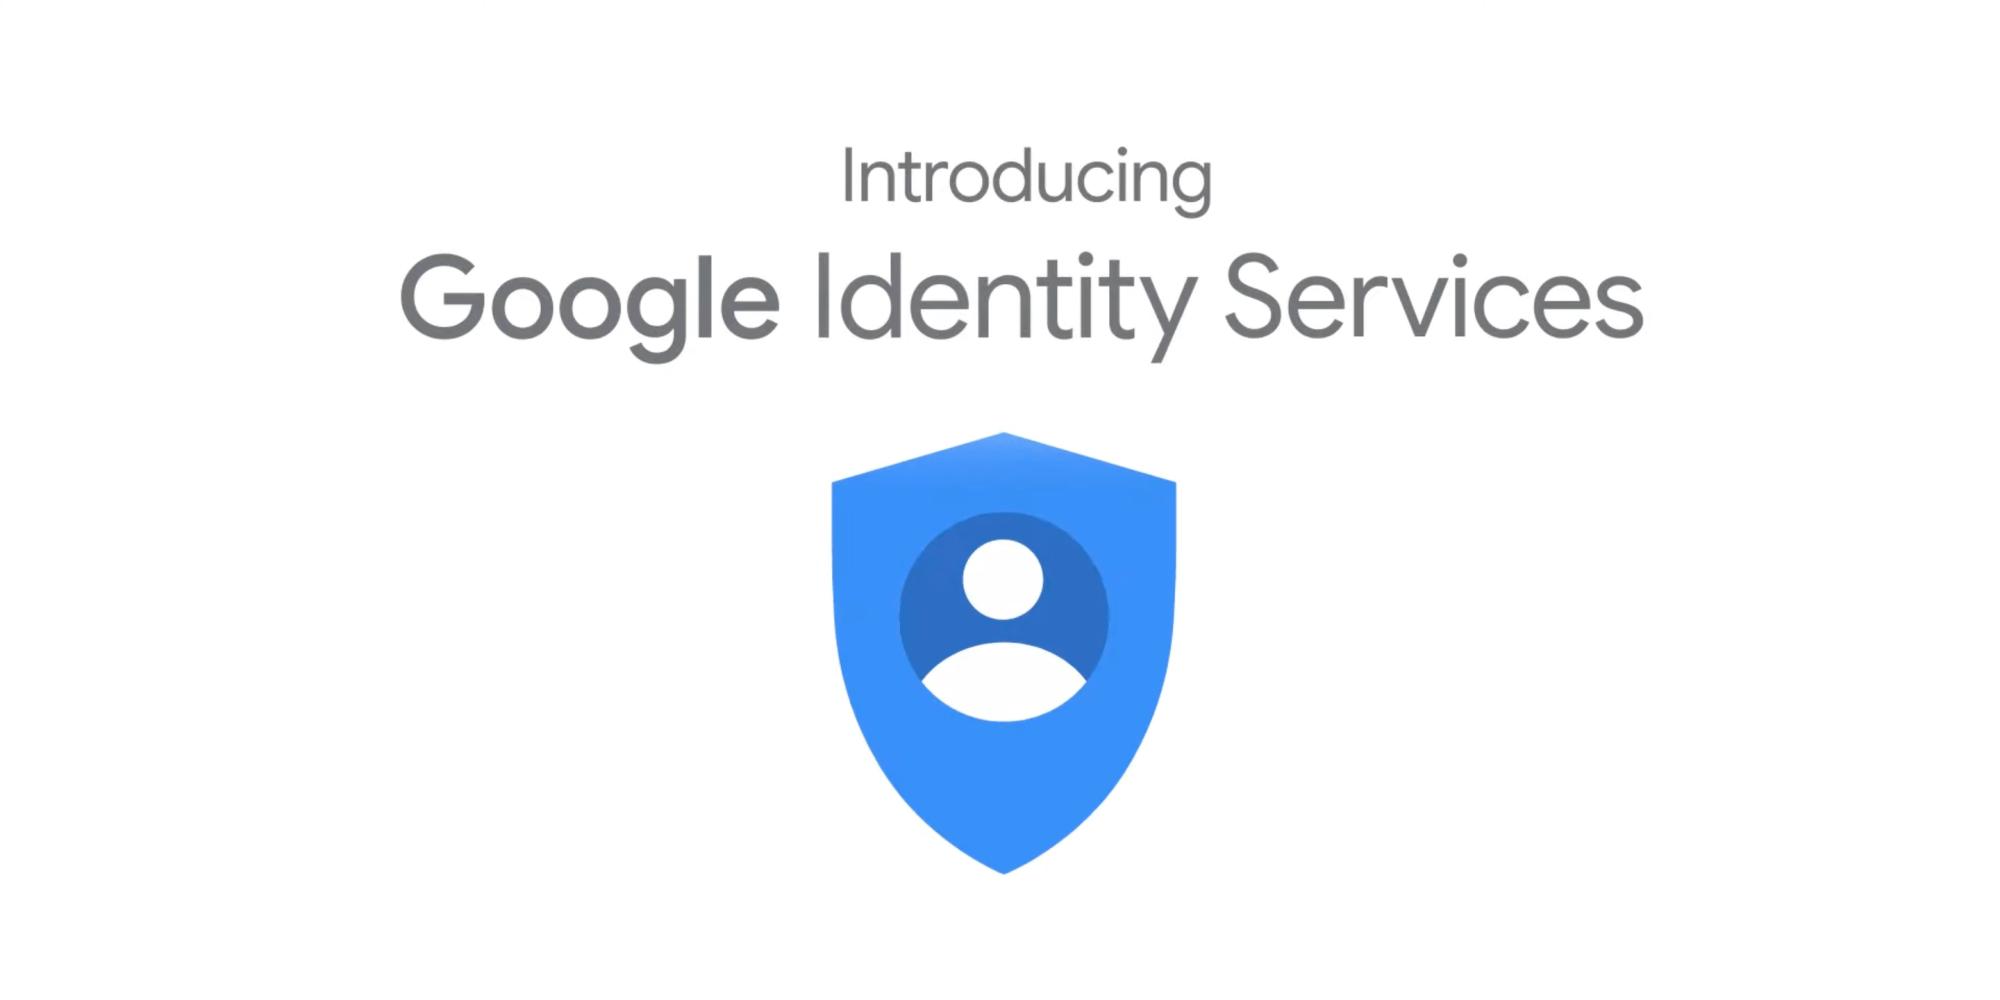 Google Identity Services